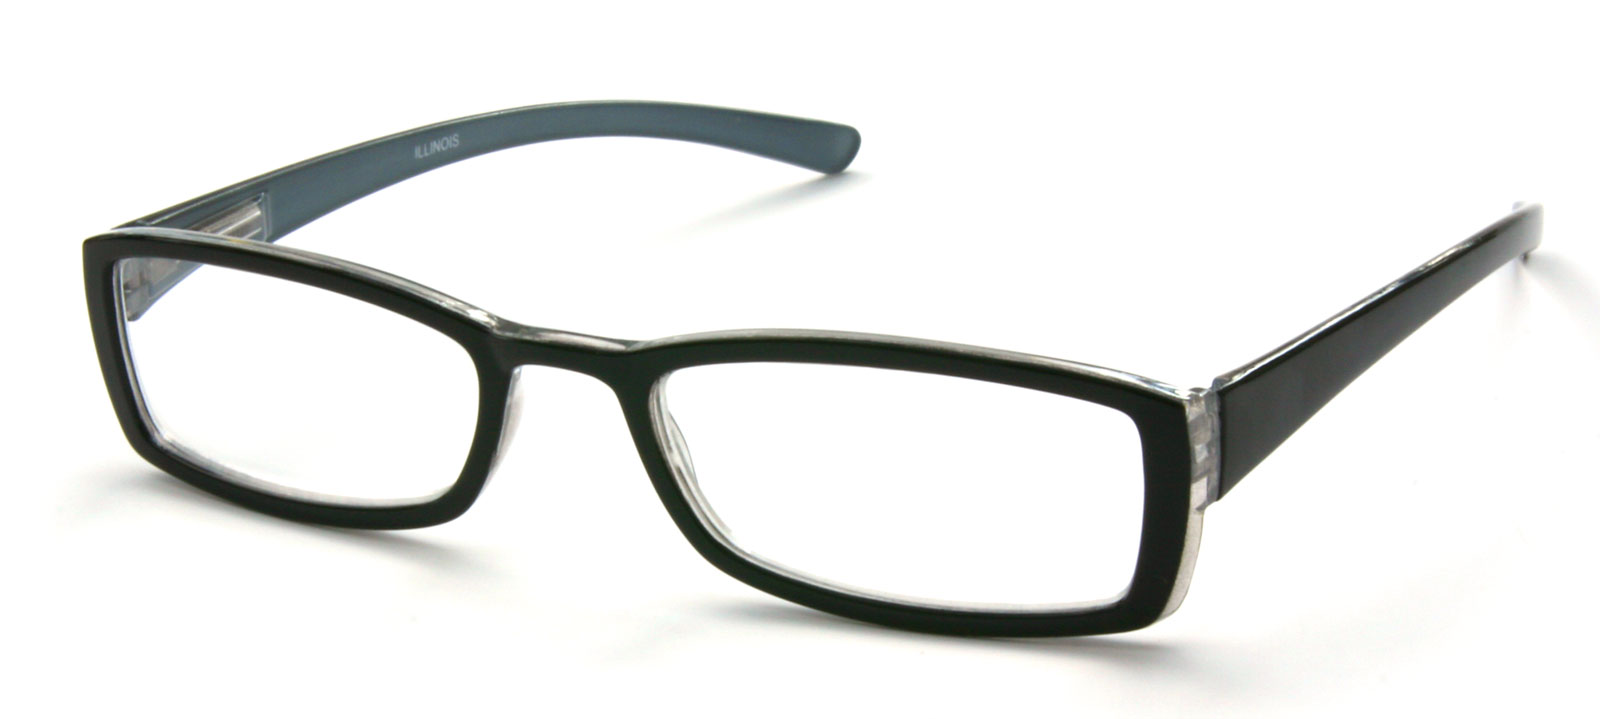 Reading Glasses Cartoon   Clipart Panda - Free Clipart Images